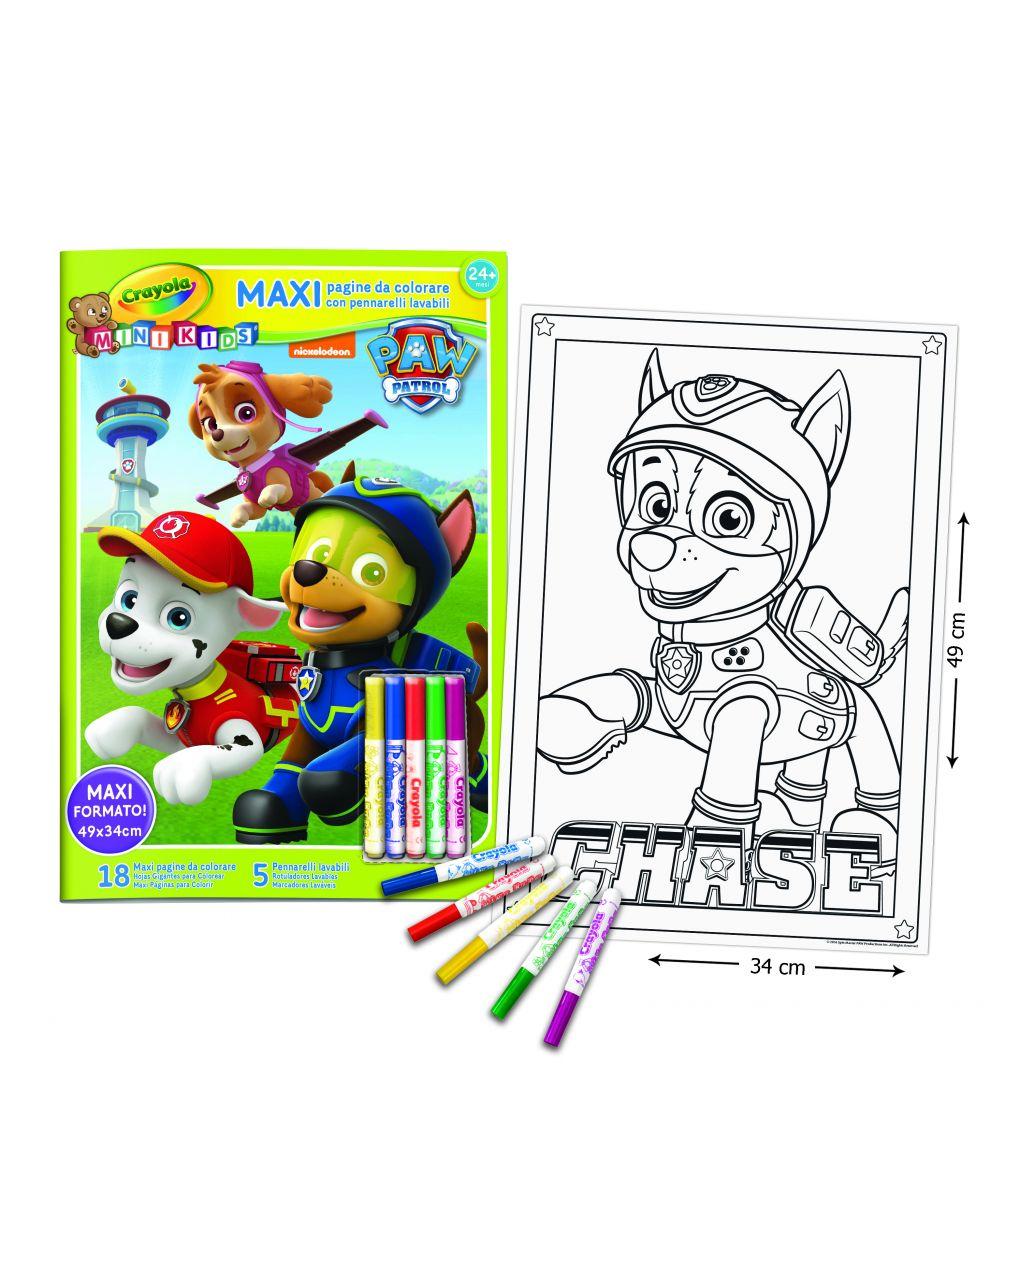 Crayola - maxi pagine da colorare paw patrol con pennarelli mini kids - Crayola